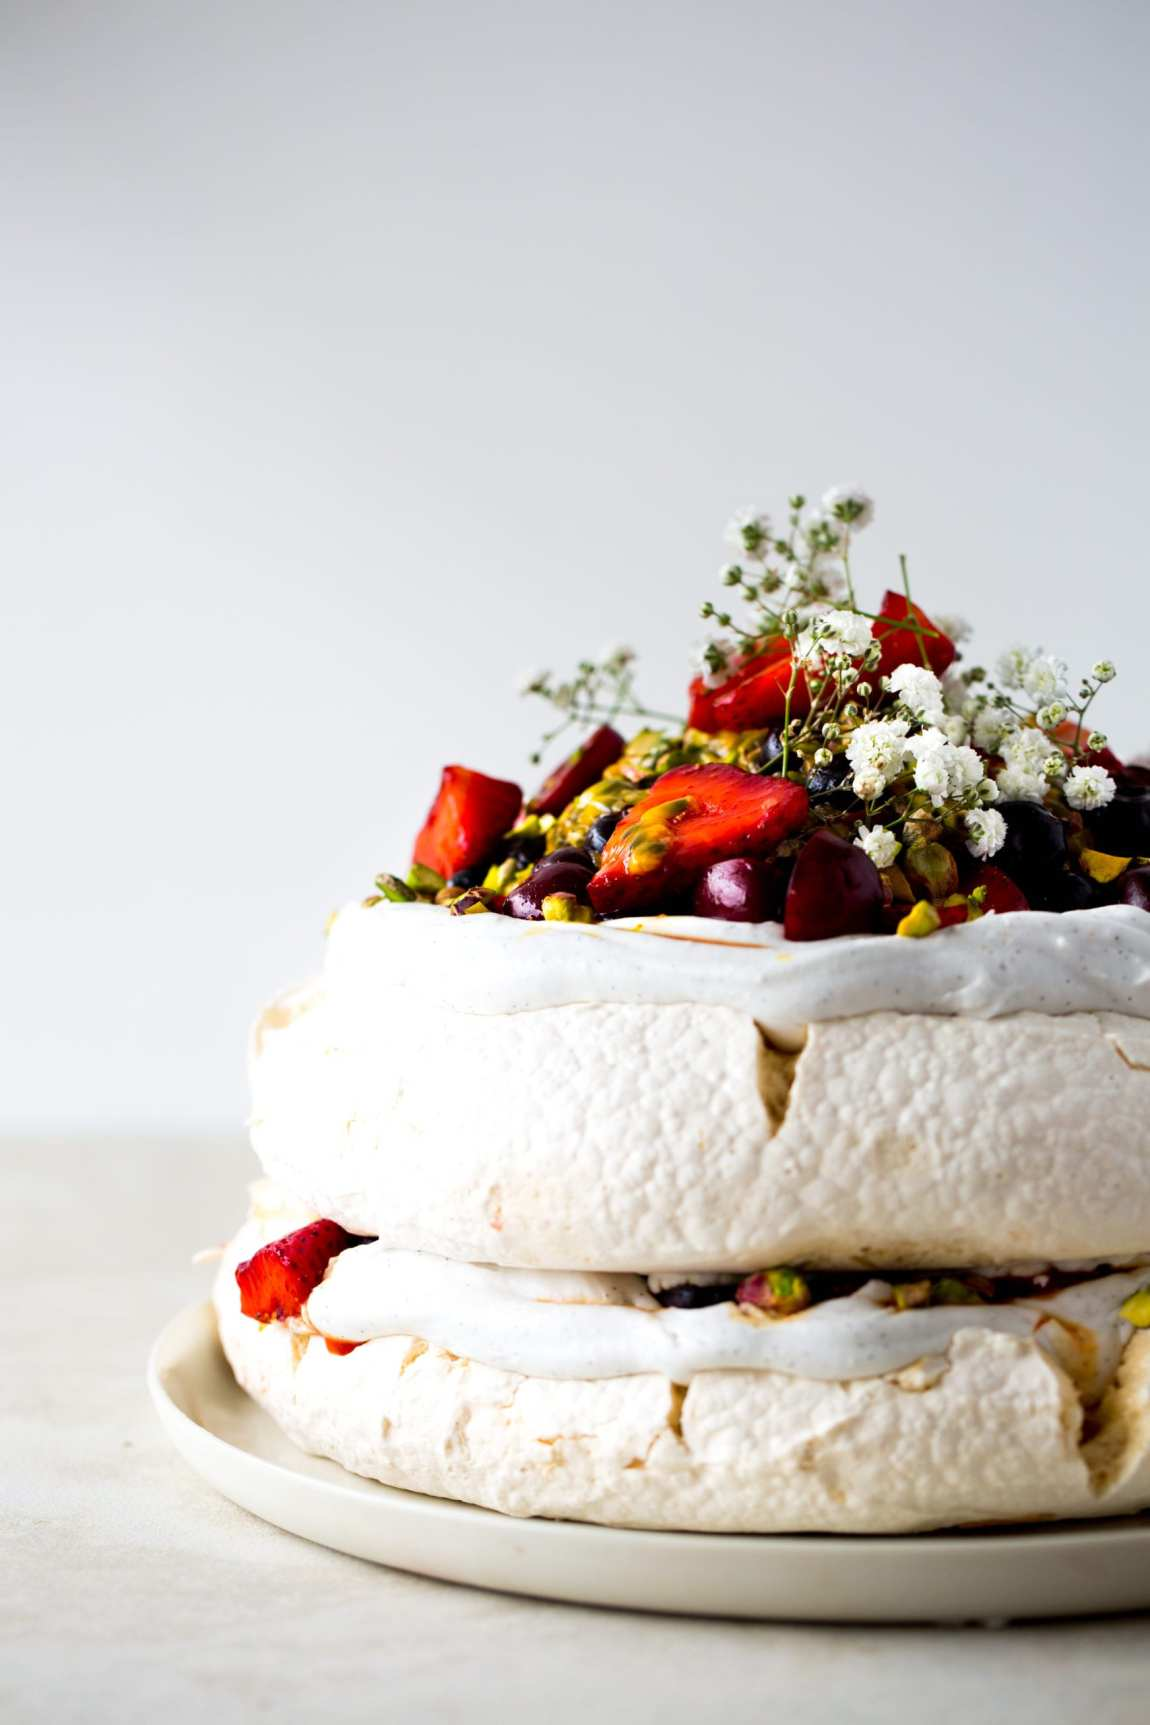 Vegan Pavlova with Saffron Berries, Passionfruit & Pistachio | The Floured Kitchen